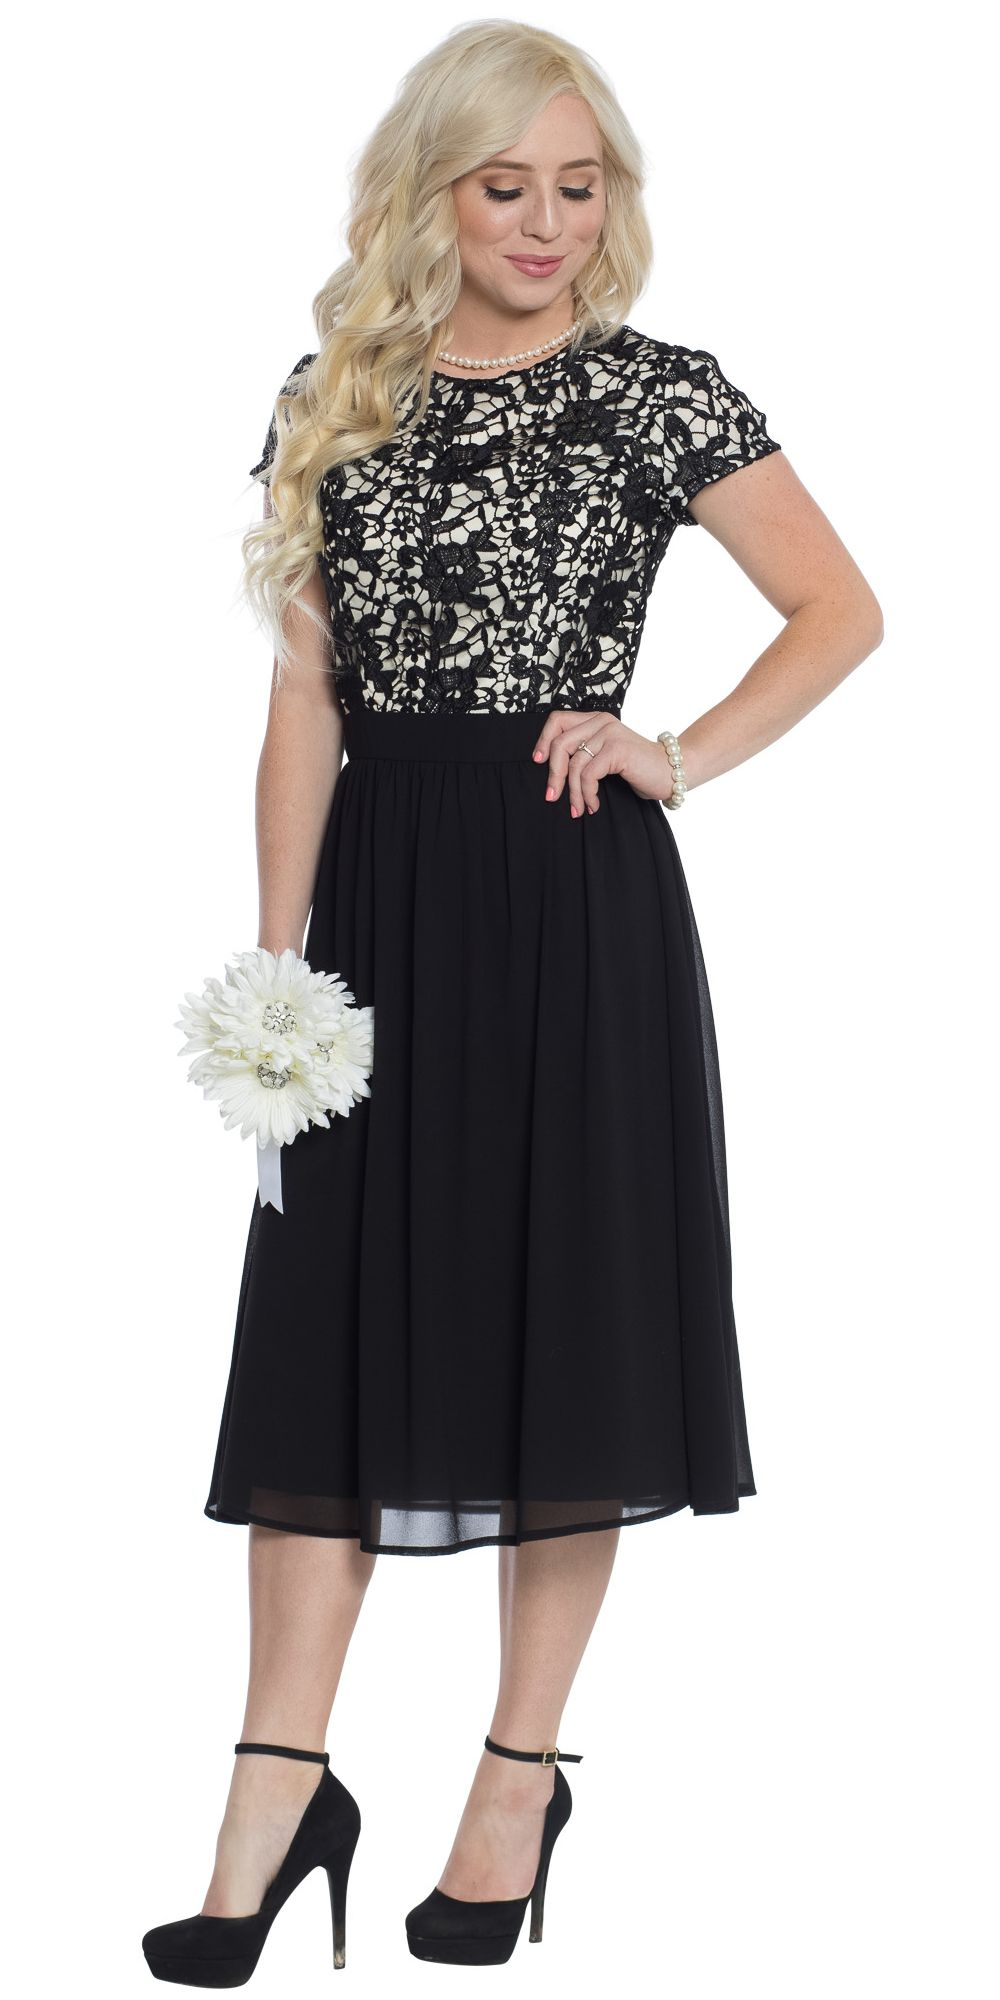 Olivia Modest Bridesmaid Dress Modest Semi Formal Dress Cocktail Dress Modest Womens Trendy Dresses Modest Dresses [ 2000 x 1000 Pixel ]